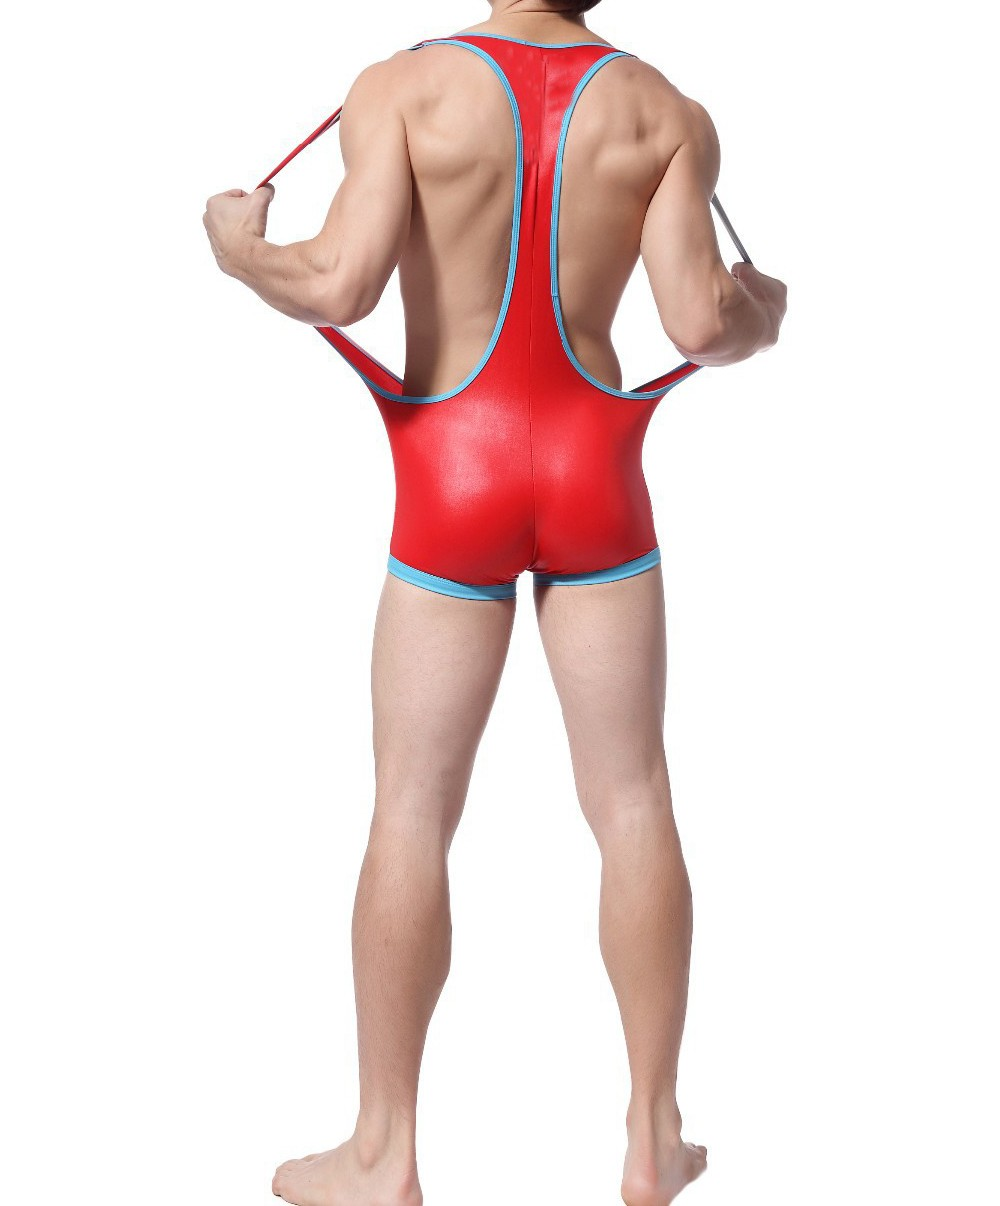 leather-men-s-underwear-singlet-sling-strap-boxer-bodysuit-jumpsuit-imitation-leather-sexy-lingerie-leotard-boxers (4)